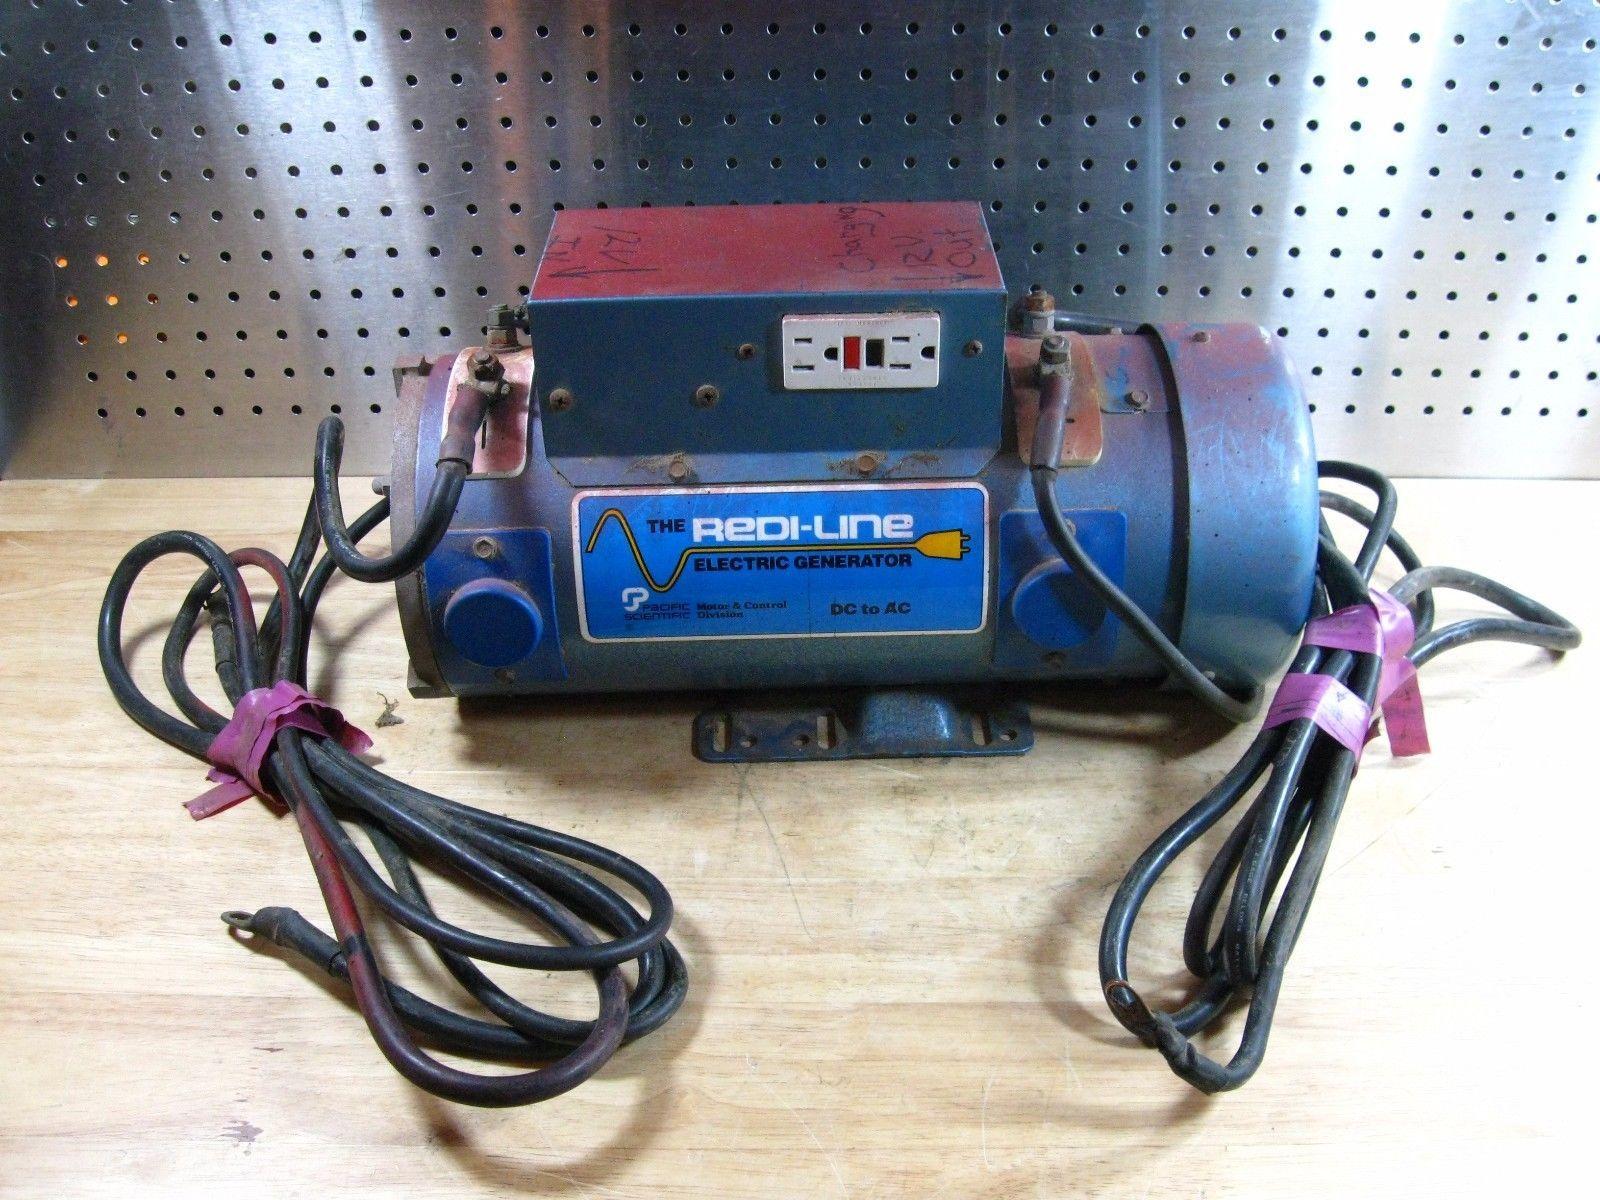 Redi Line Electric Generator Da12l 1600 Gfi 12v Dc 120v Ac Generator 1600w Stuff To Buy Electronic Products Walkman